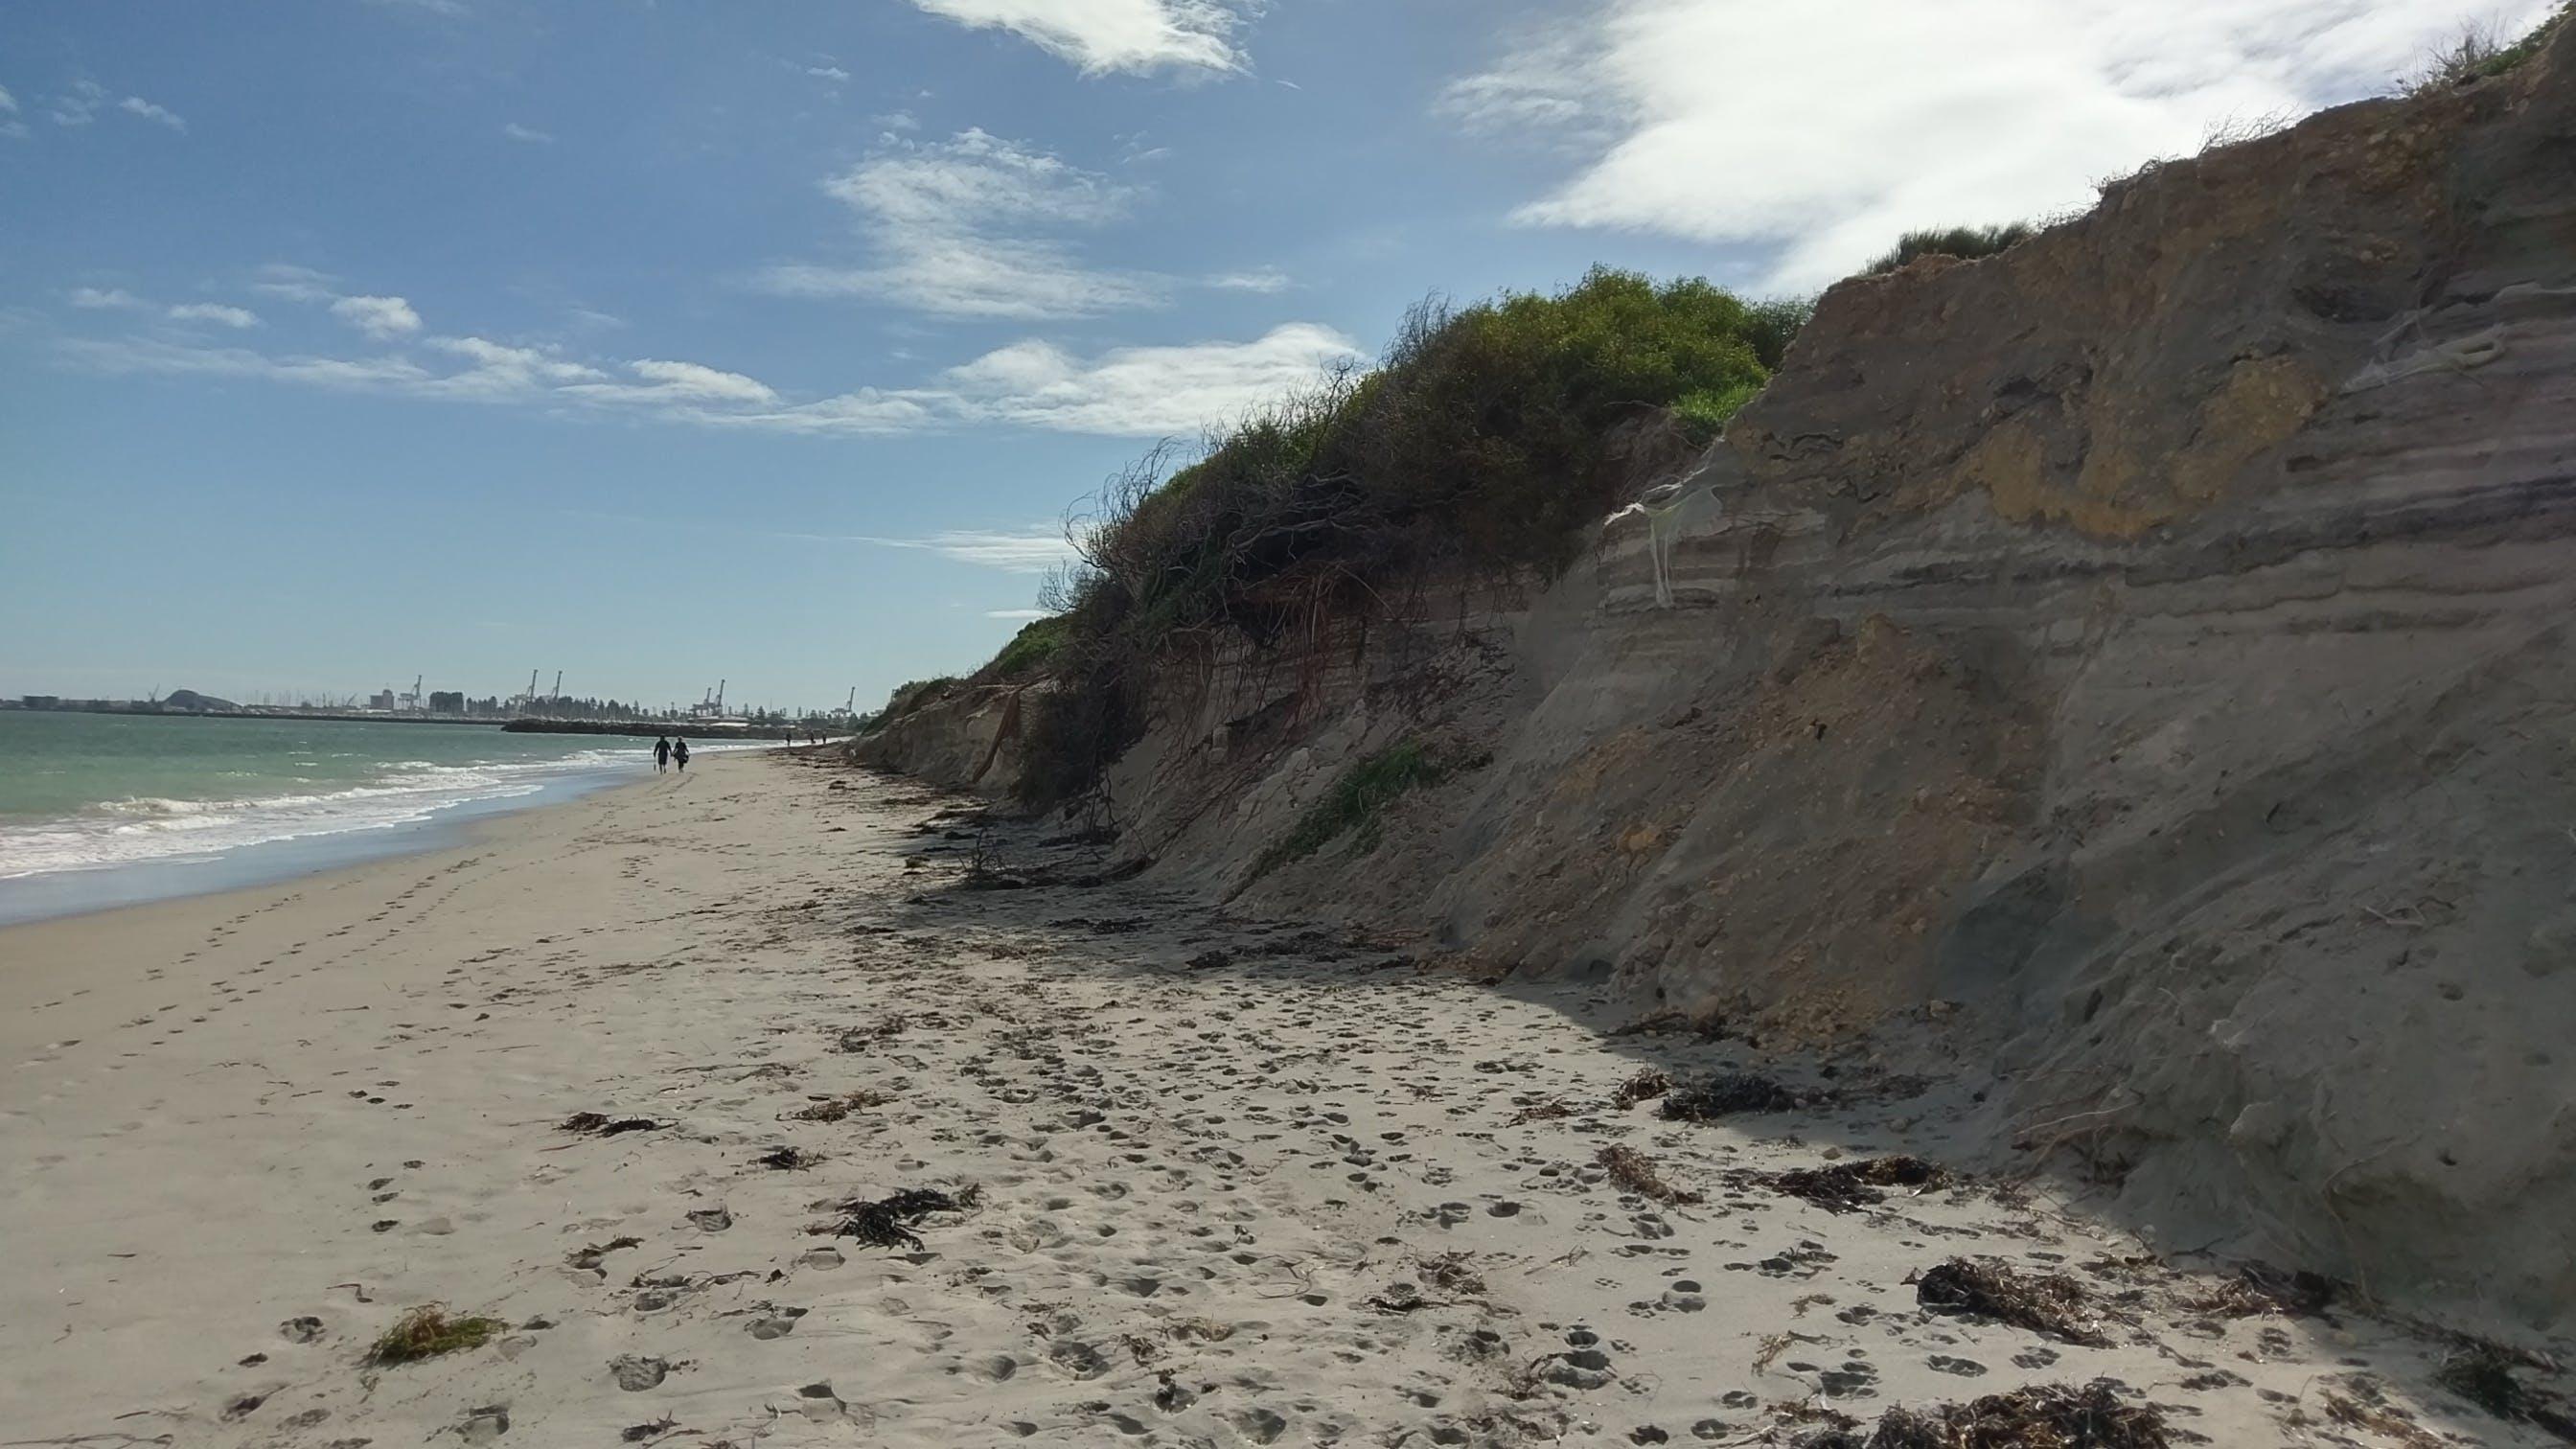 2017 - Shoreline Erosion